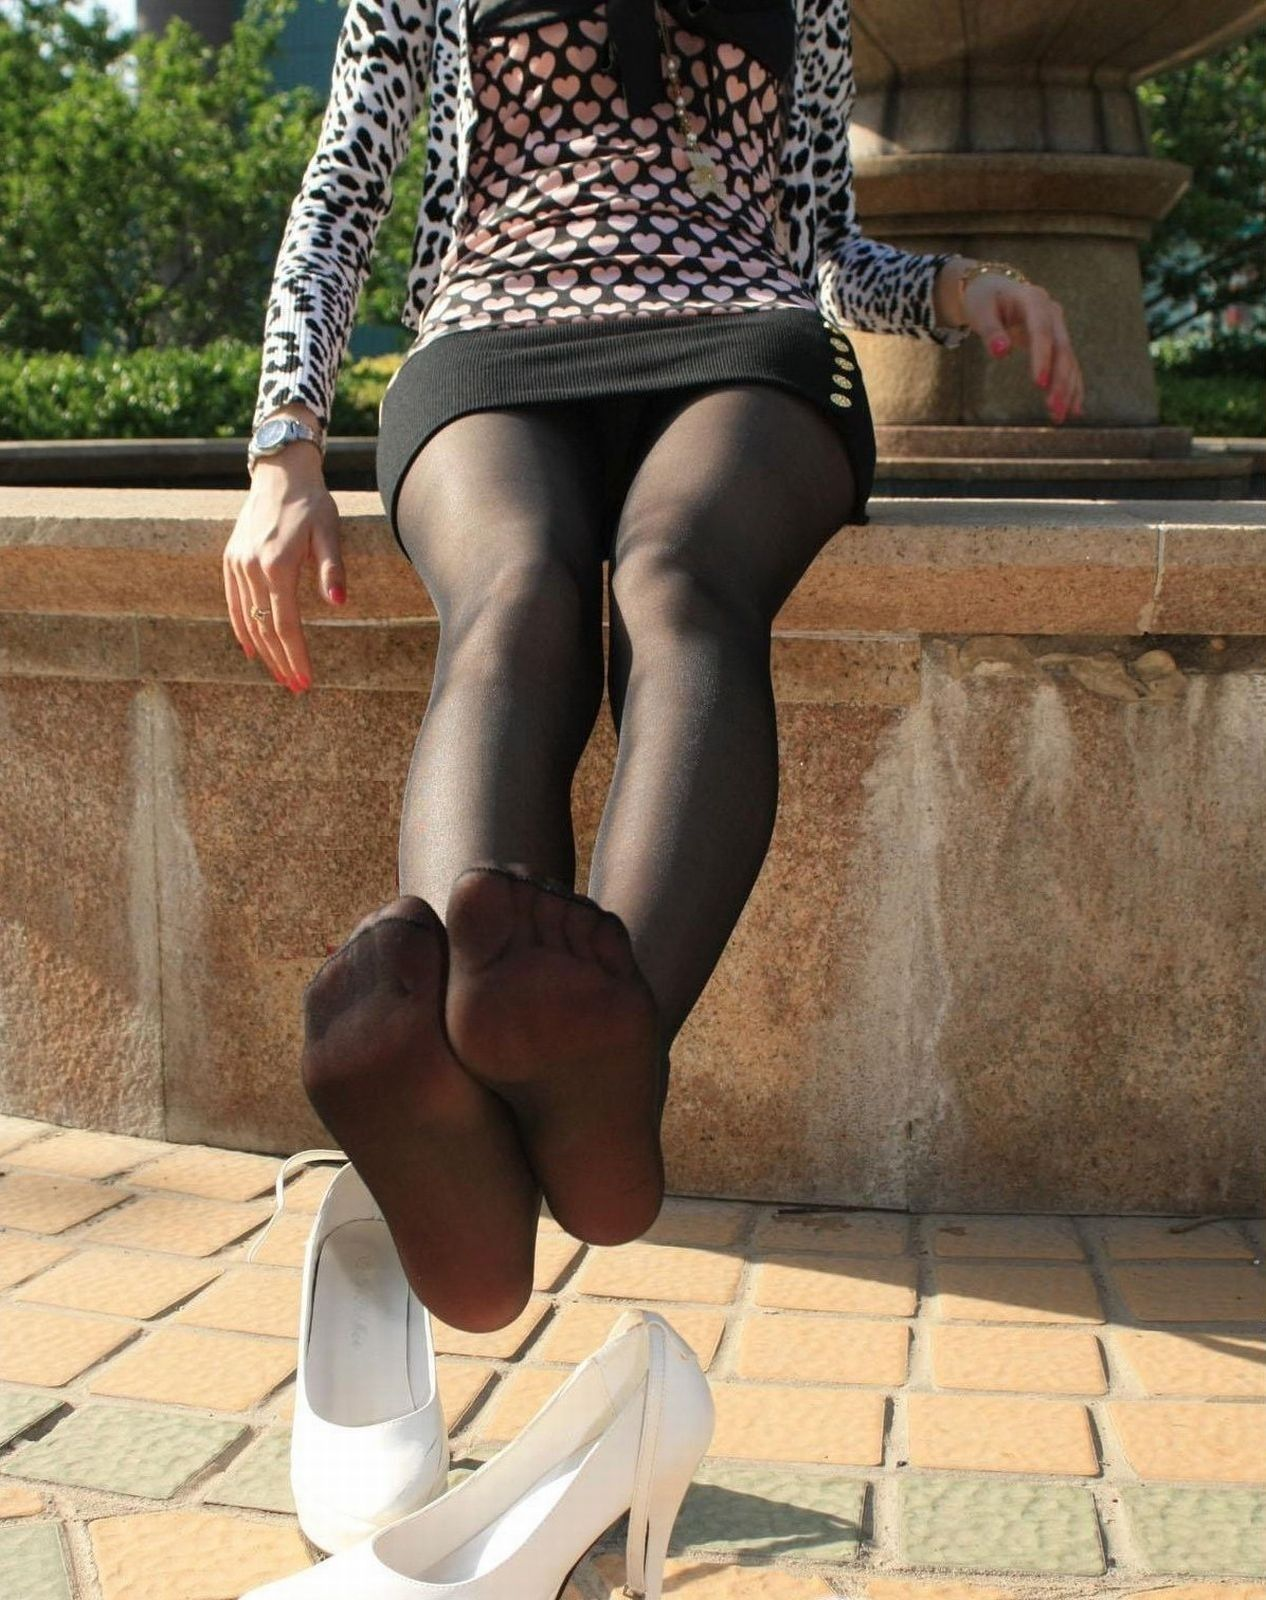 Art Bonn Lace Up Boots Brown E11l6726 Lace up Ankle Boots for women Missguided Sale